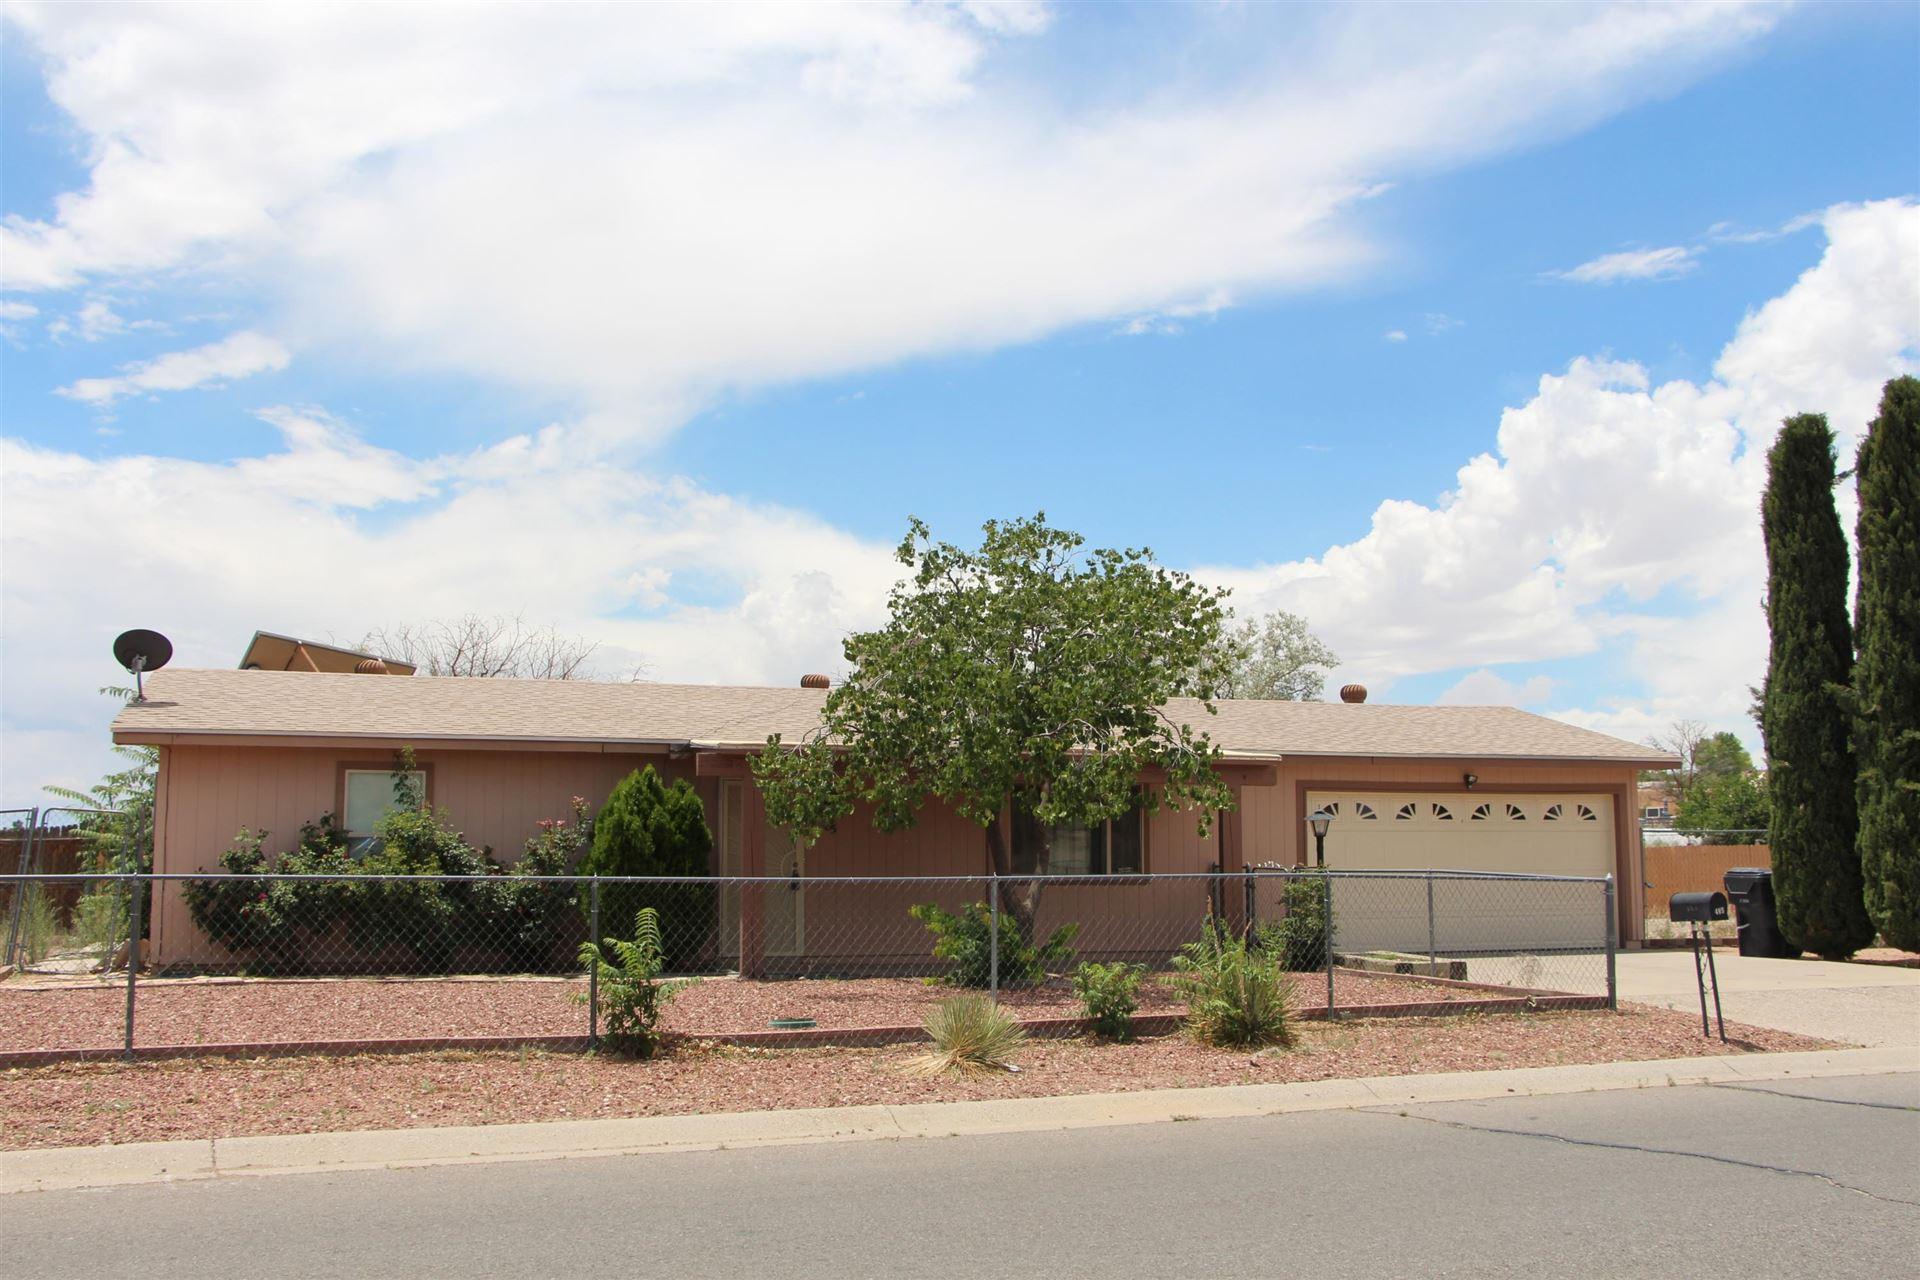 485 SUGAR Road SE, Rio Rancho, NM 87124 - MLS#: 995229